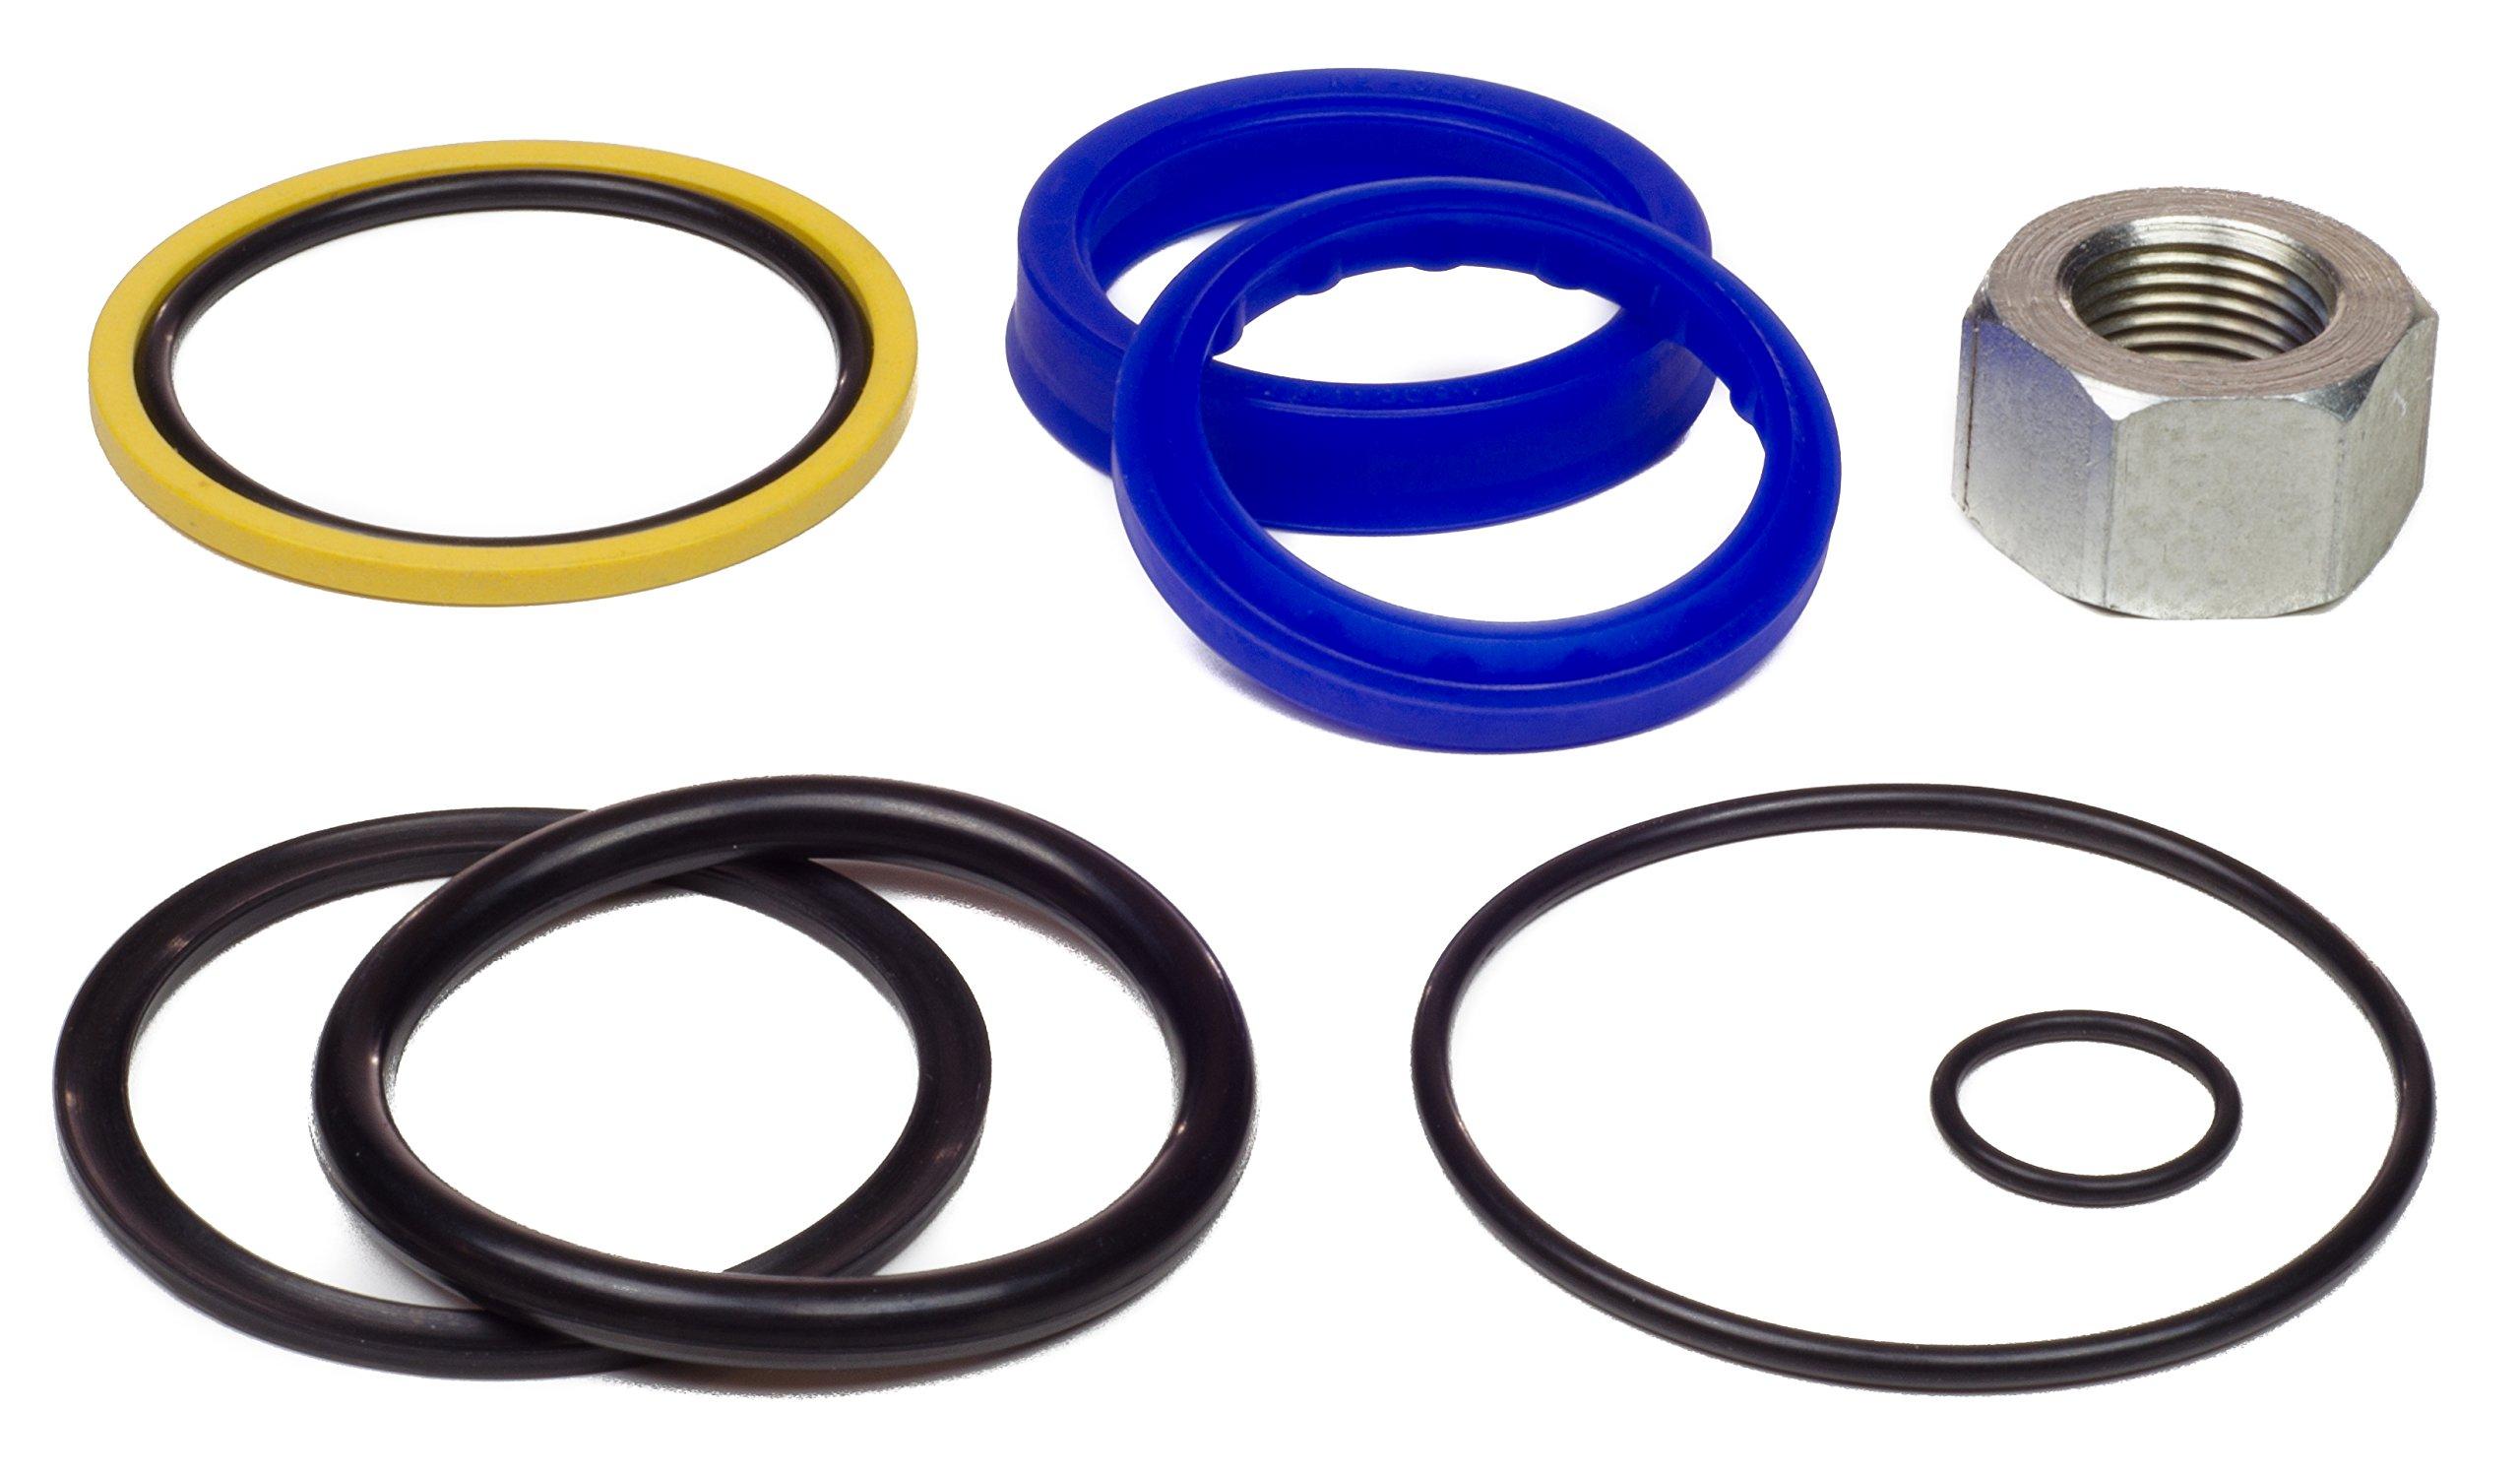 Kit King - Bobcat 6589793 Aftermarket Hydraulic Cylinder Seal Kit